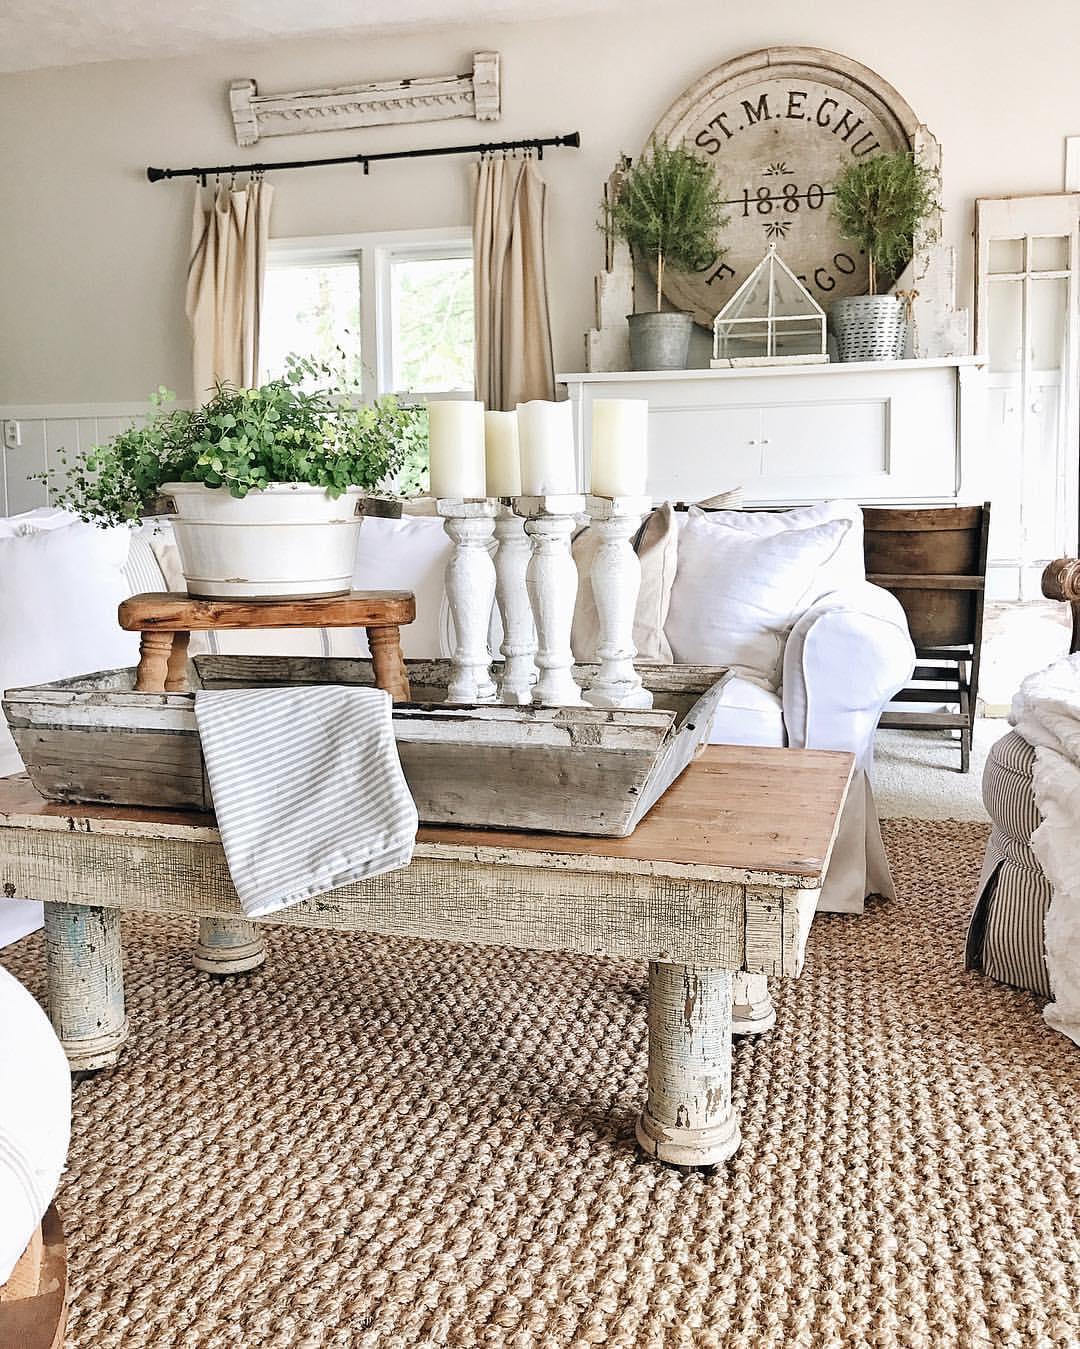 Impresionantes Muebles de Granja e Ideas de Decoración